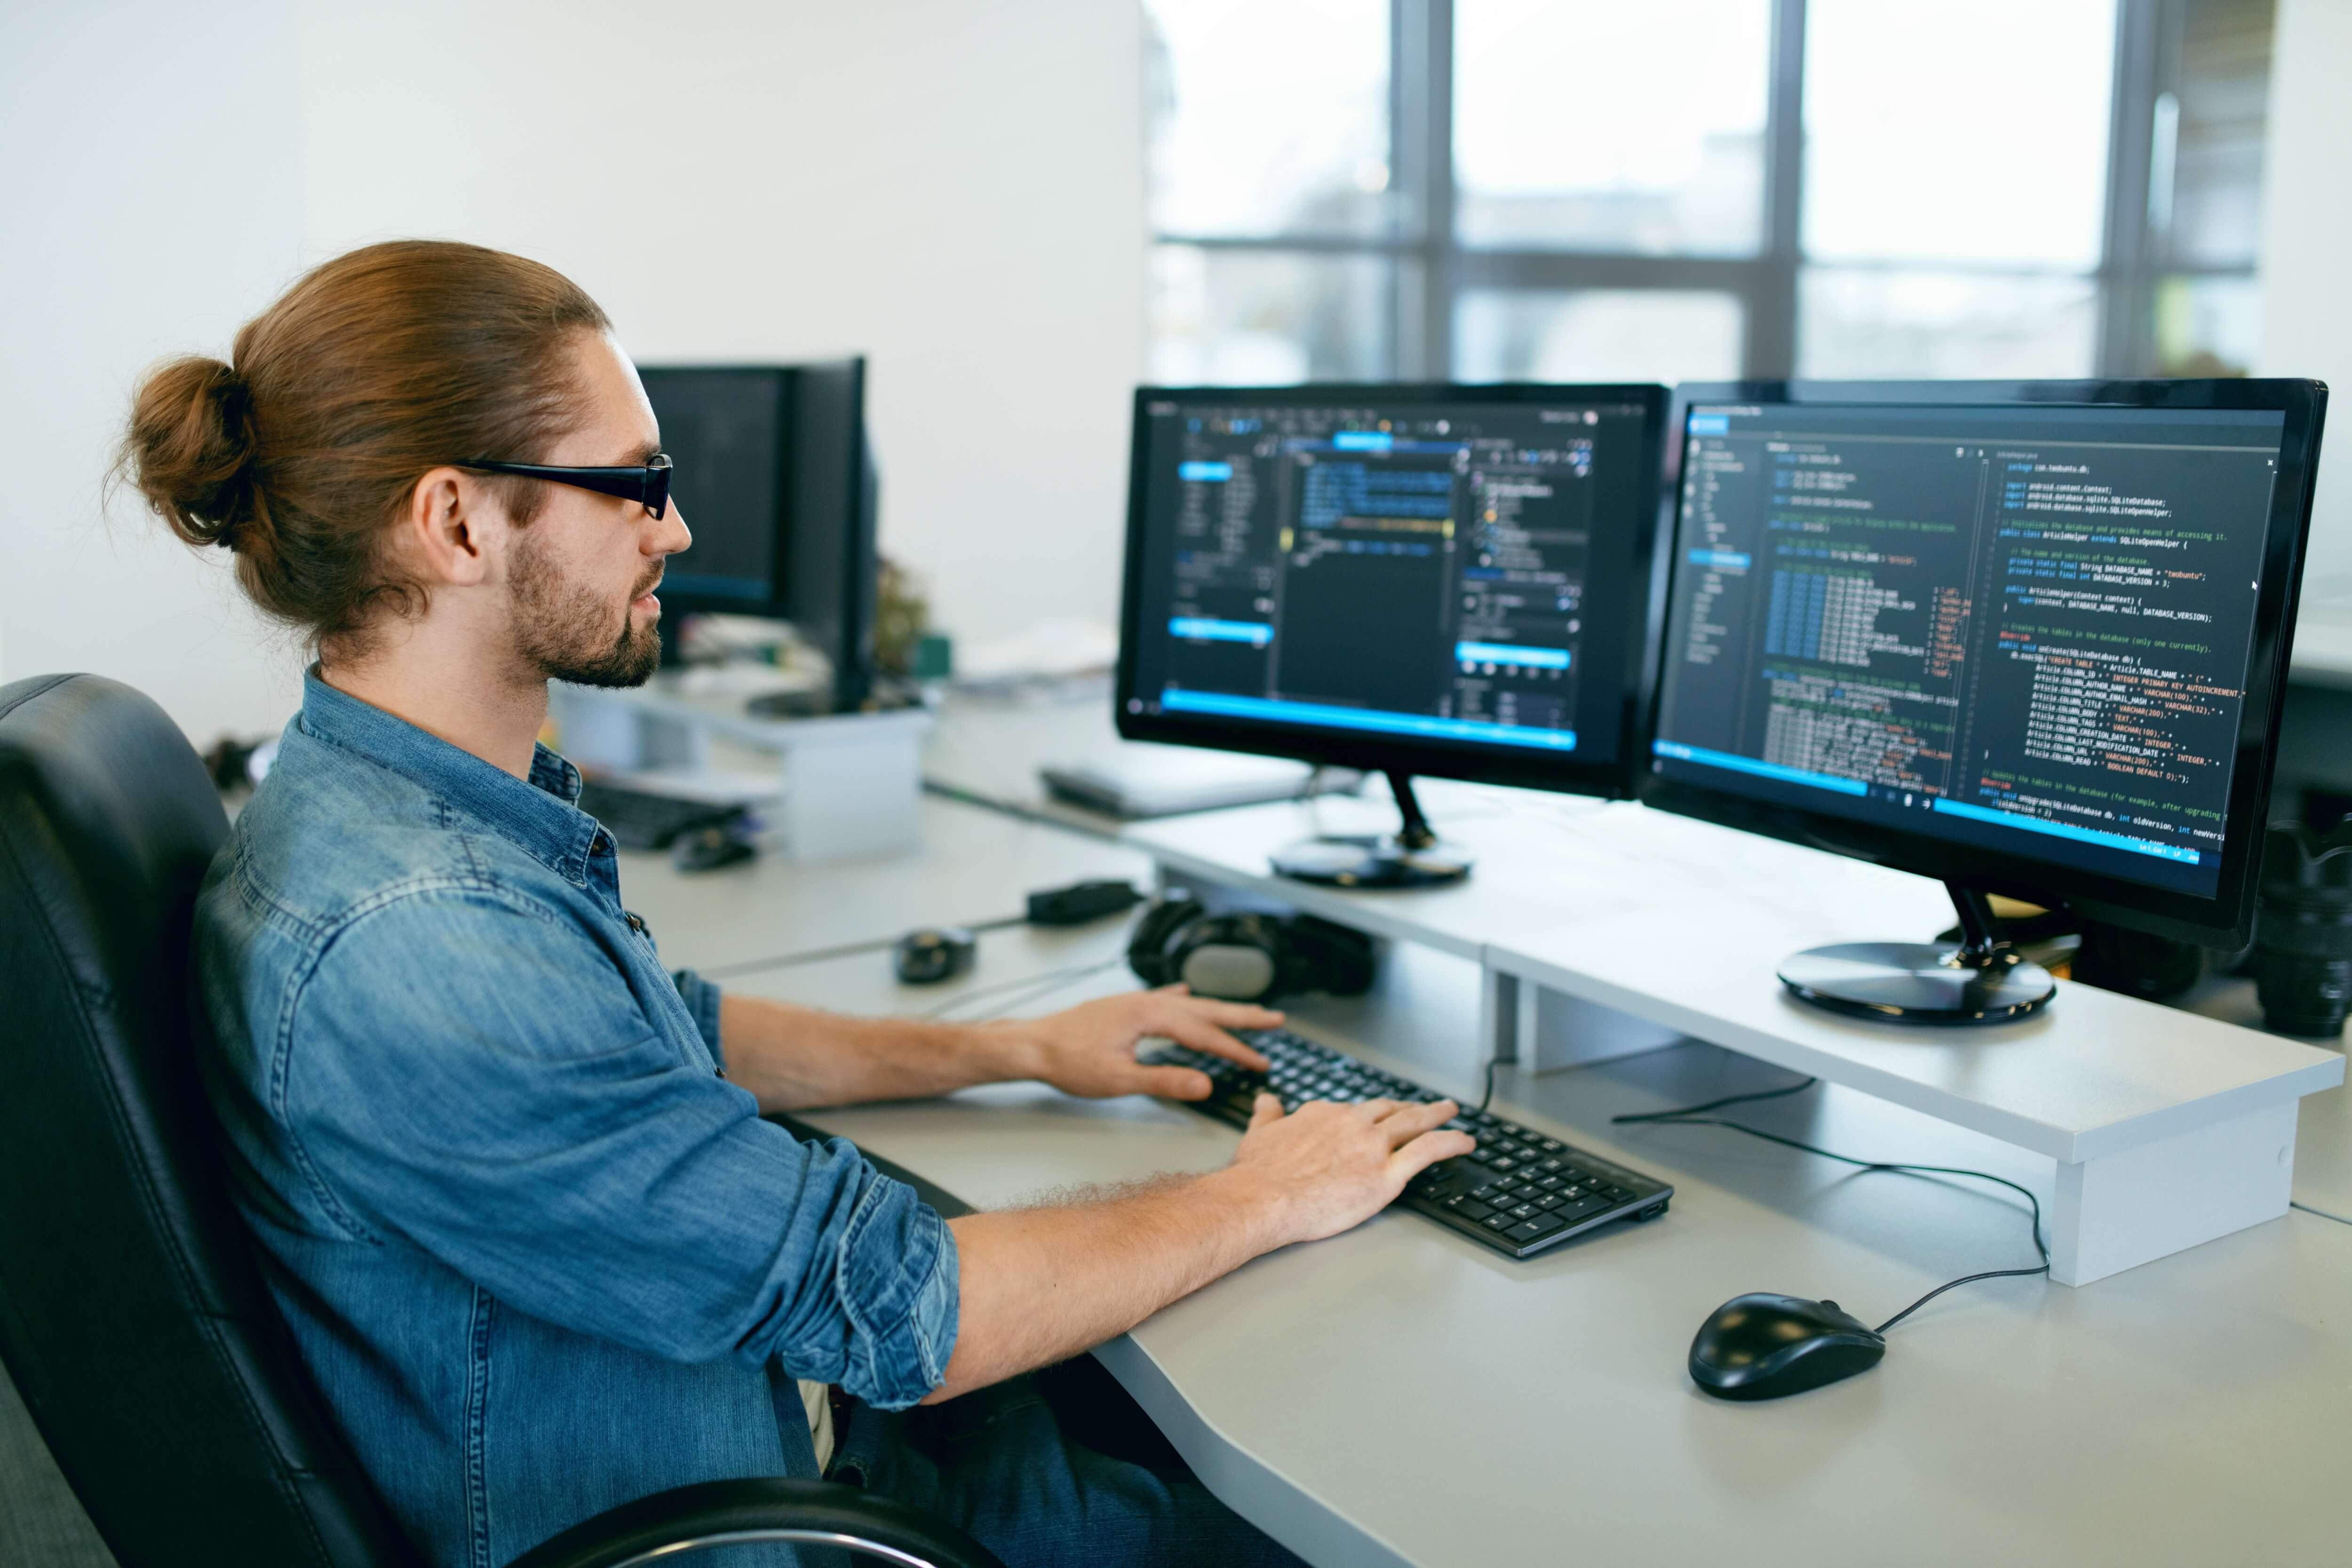 Man sitting at a desk programming software